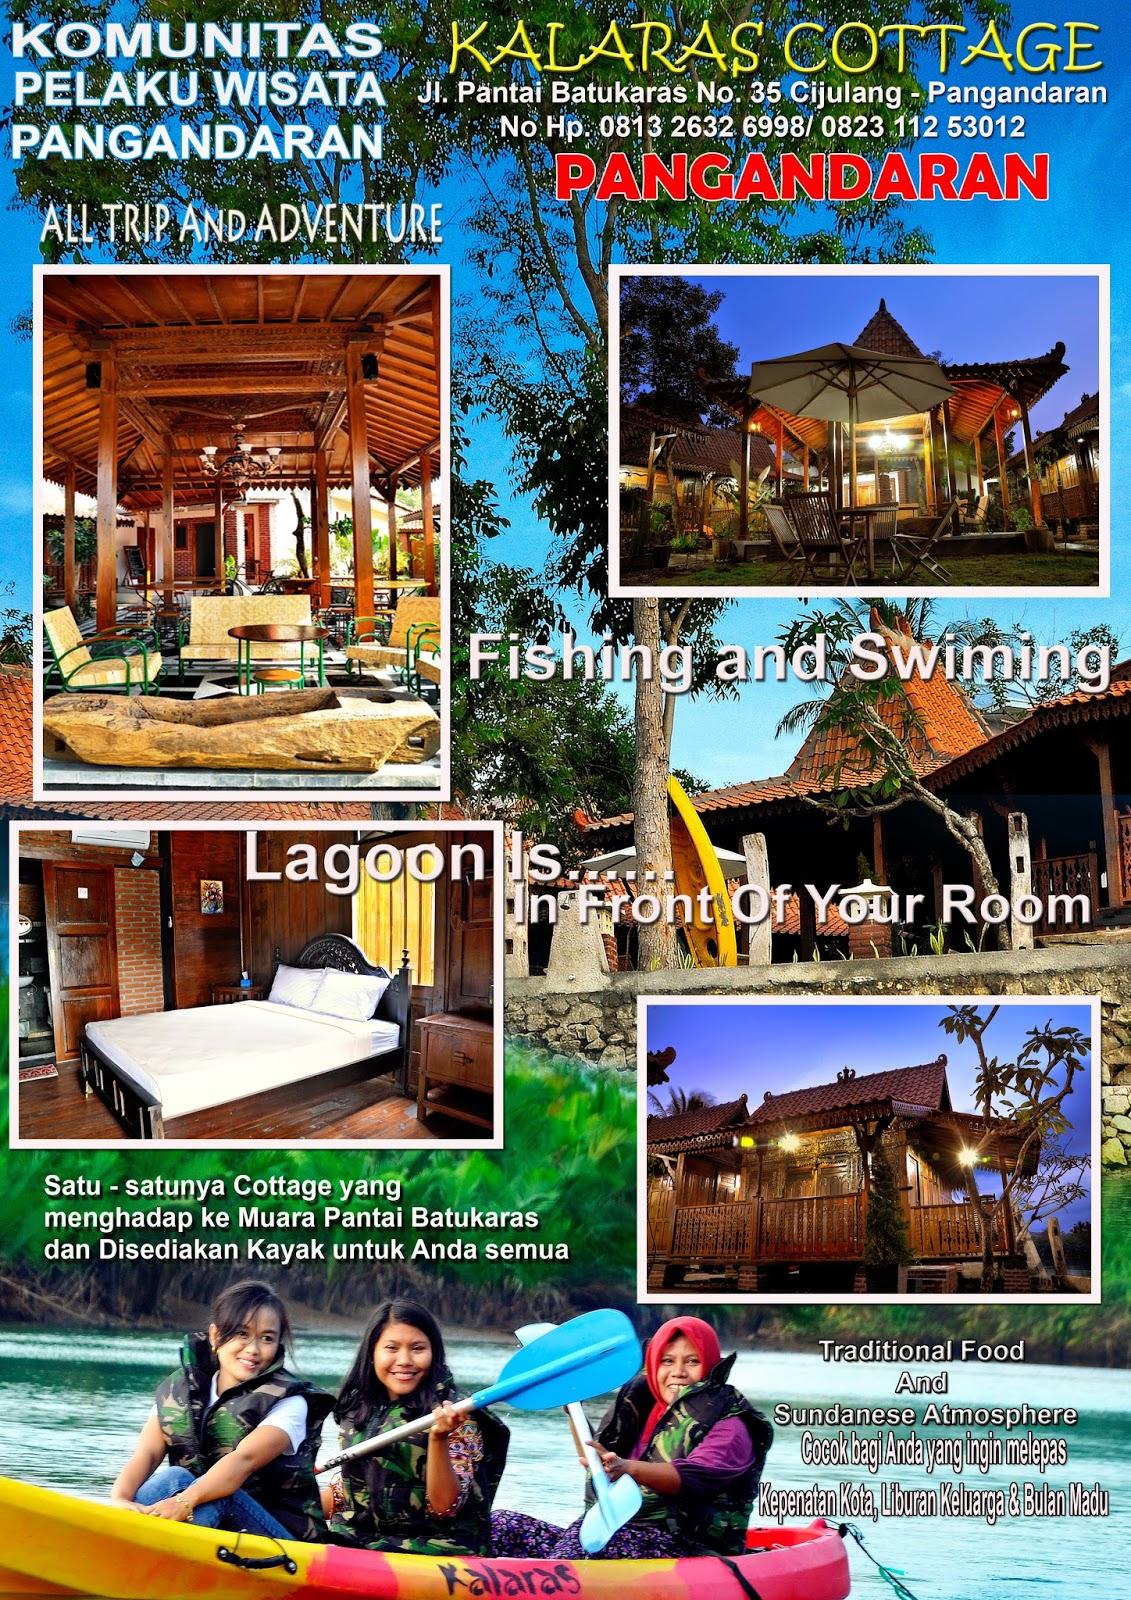 Contoh Desain Pamflet Promo Tempat Wisata - LAPTOP BUTUT